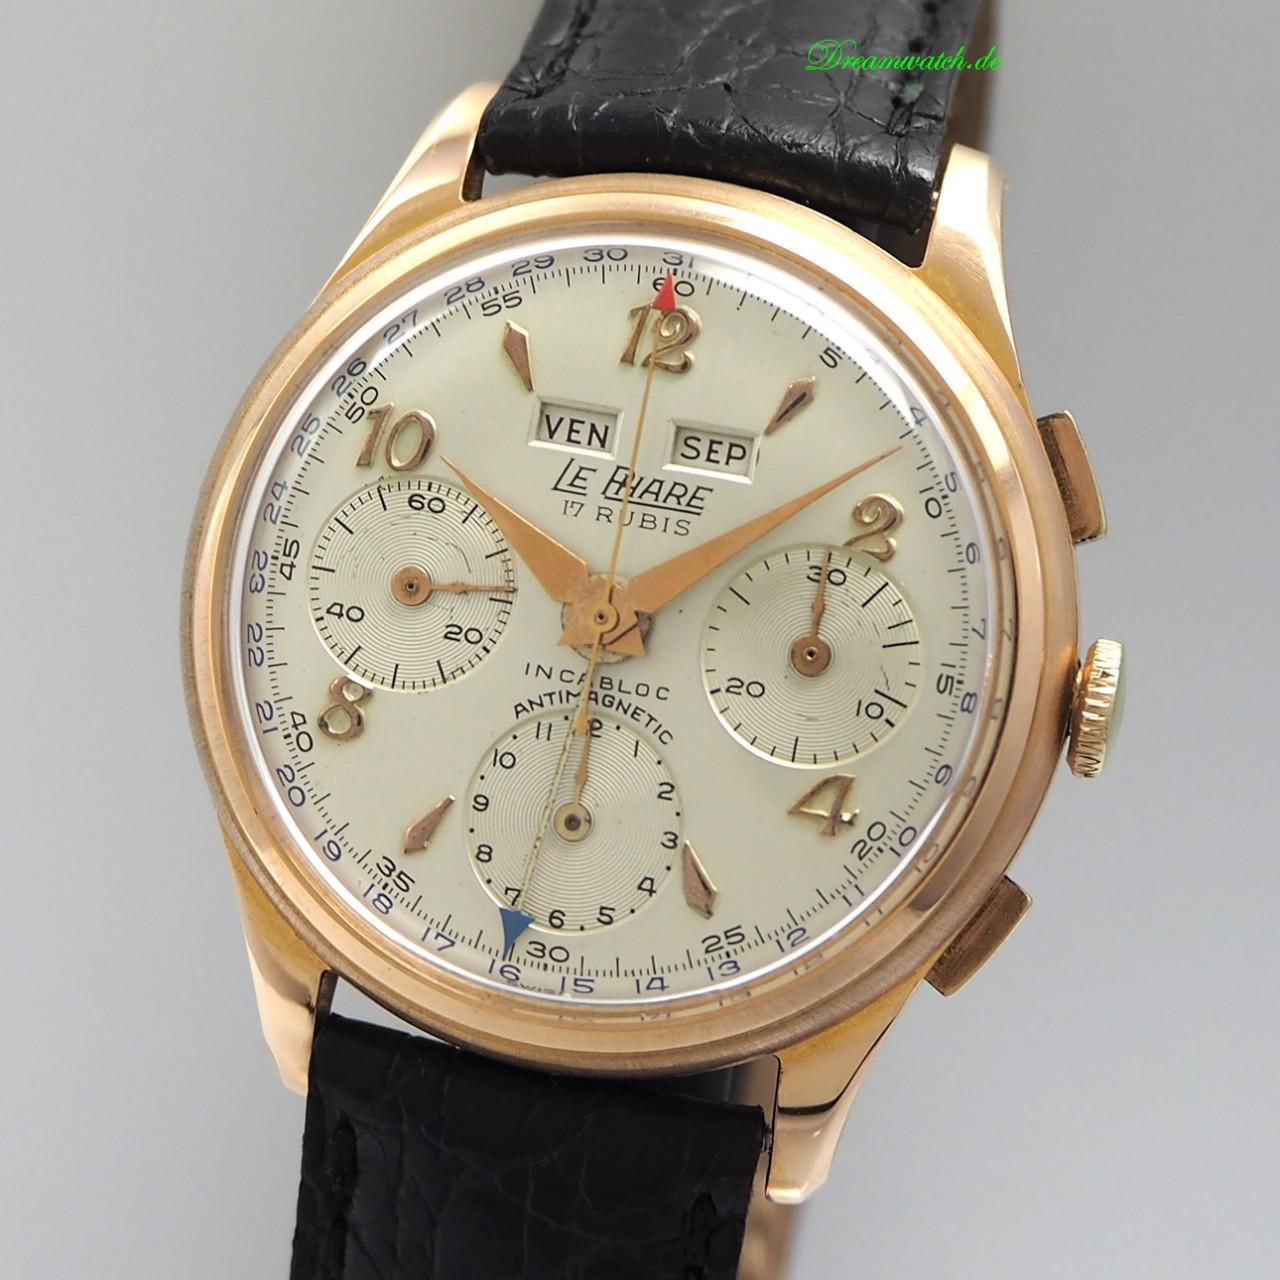 Le Phare Chronograph Vintage Handaufzug Cal.Val.72c Roségold 18k